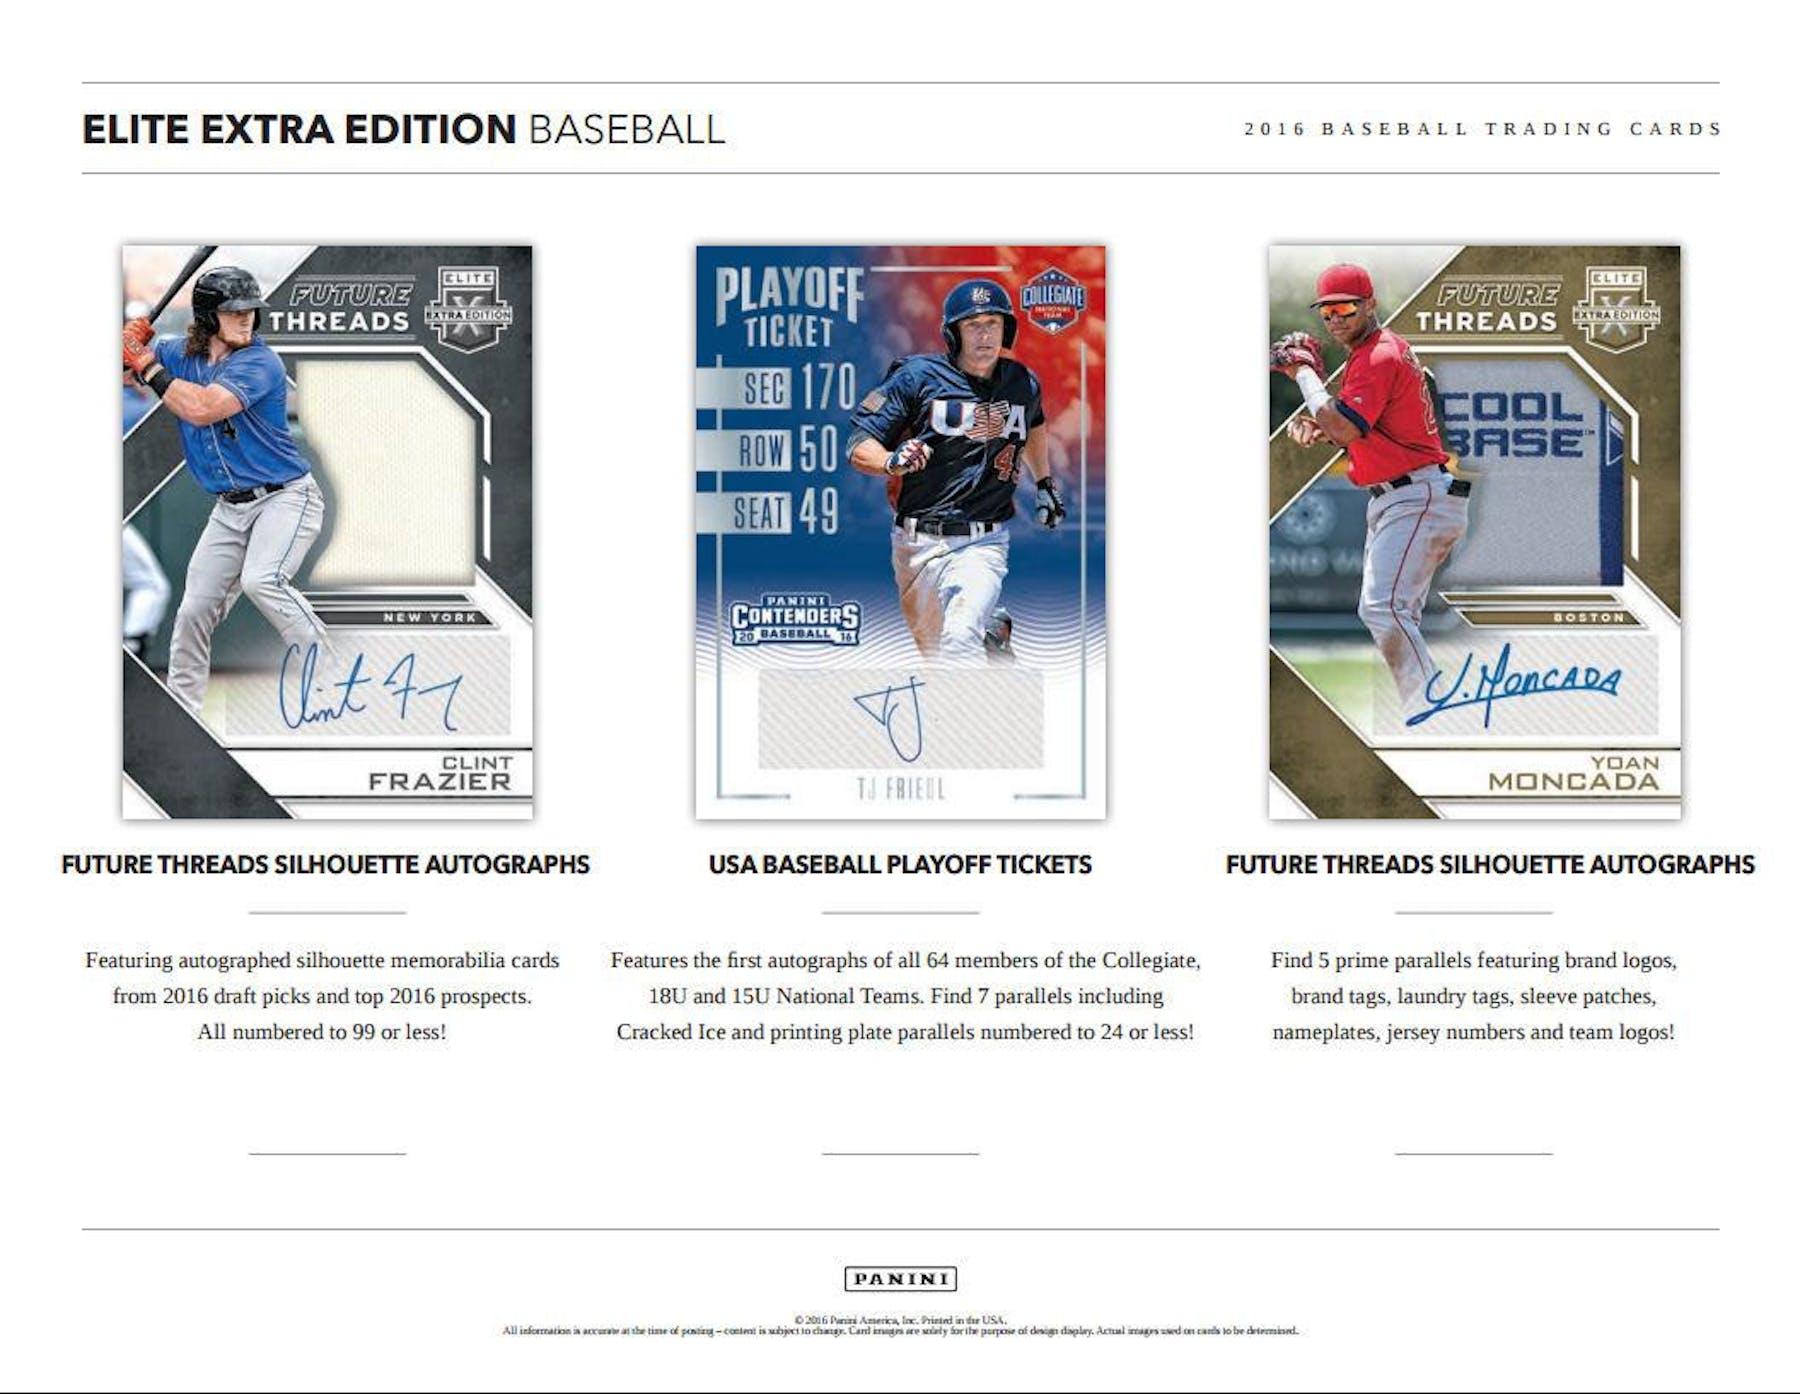 af3a03970e8 ... 2016 Panini Elite Extra Edition Longevity Baseball Box